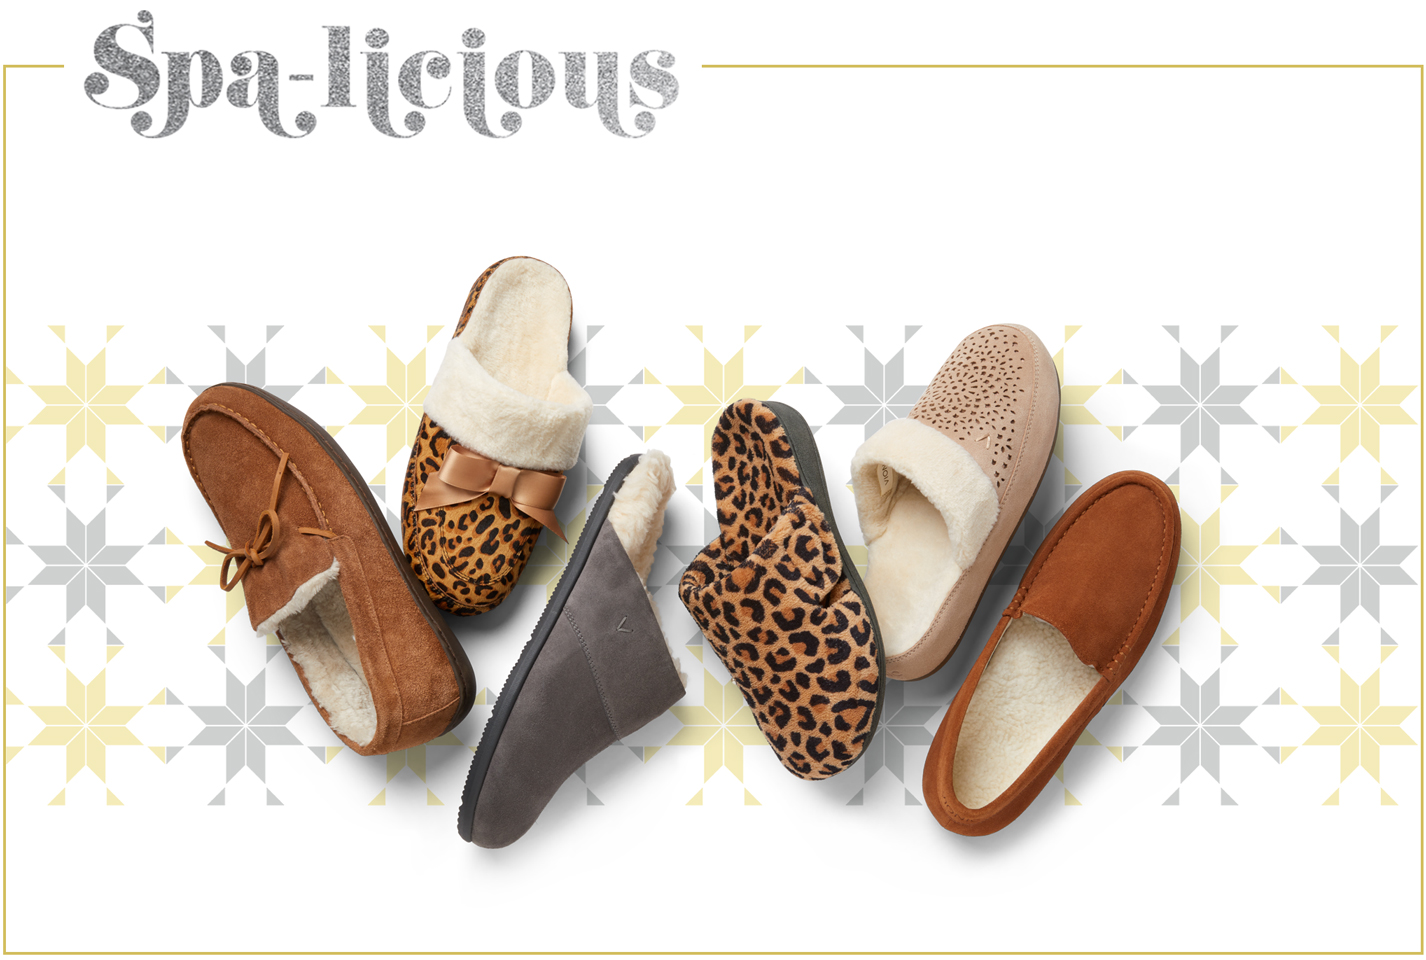 Vionic Shoes: Comfortable Stylish Shoes, Sandals, Boots & More